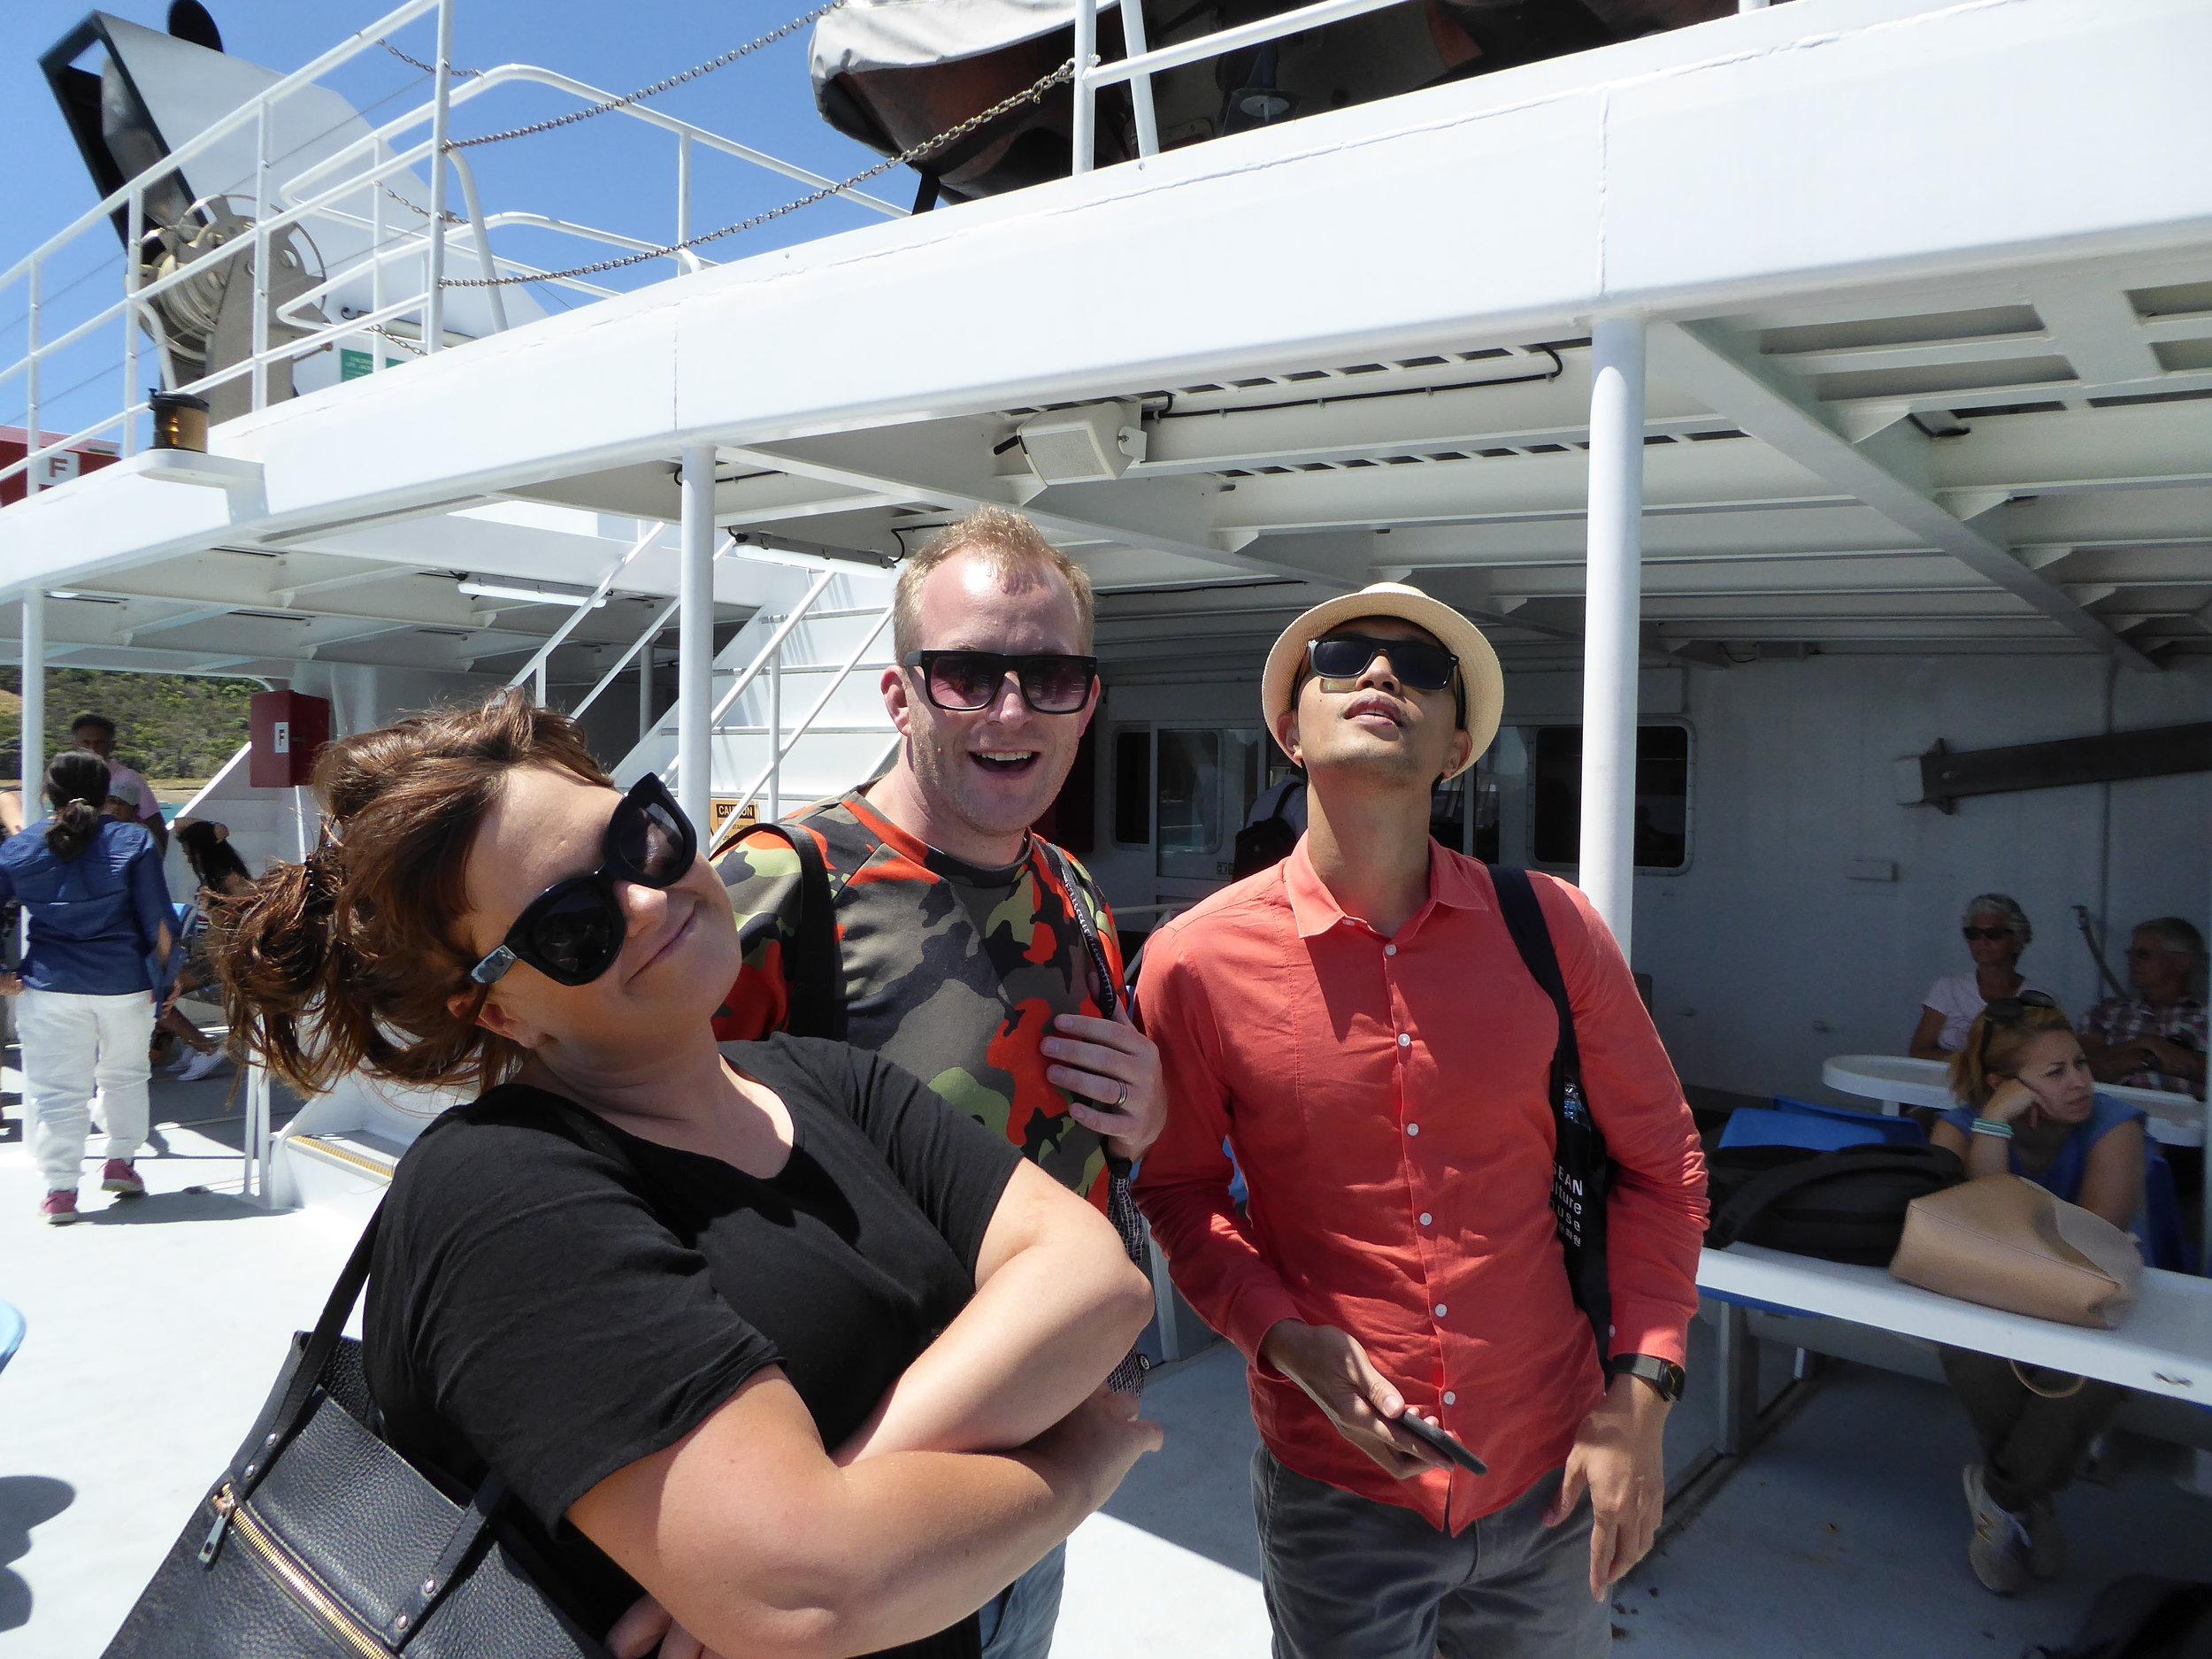 Reunited! Bianca, Kaleb and Girard.